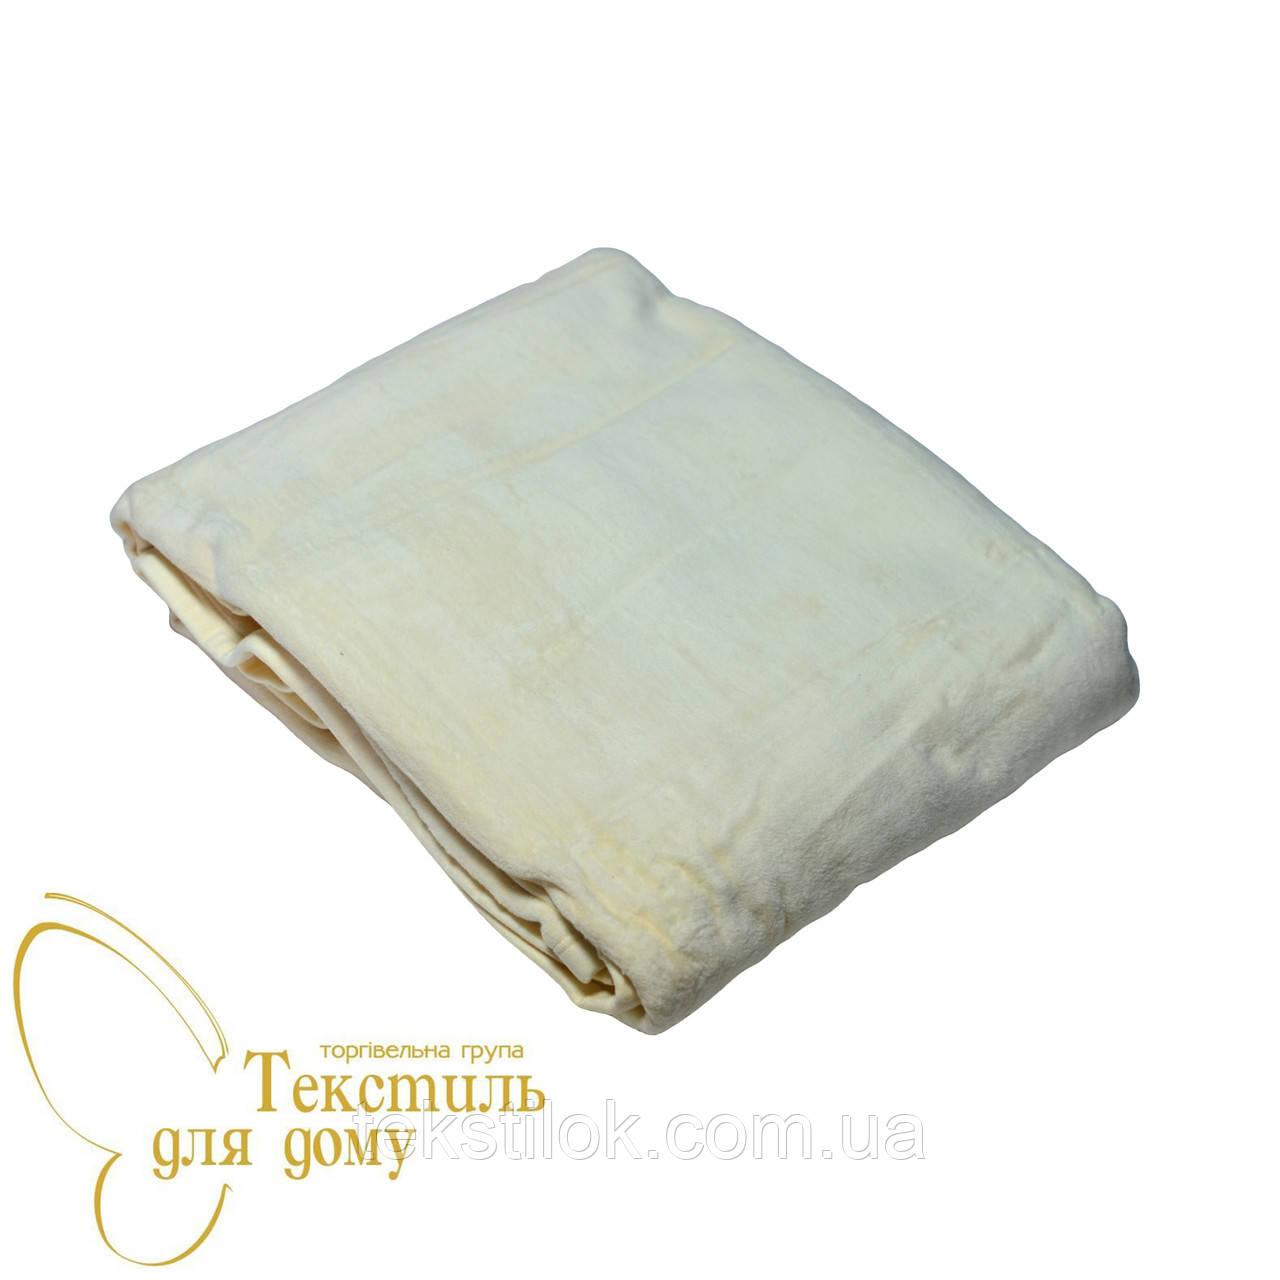 Плед 200*220 однотонный Cotton/Acril Doubl